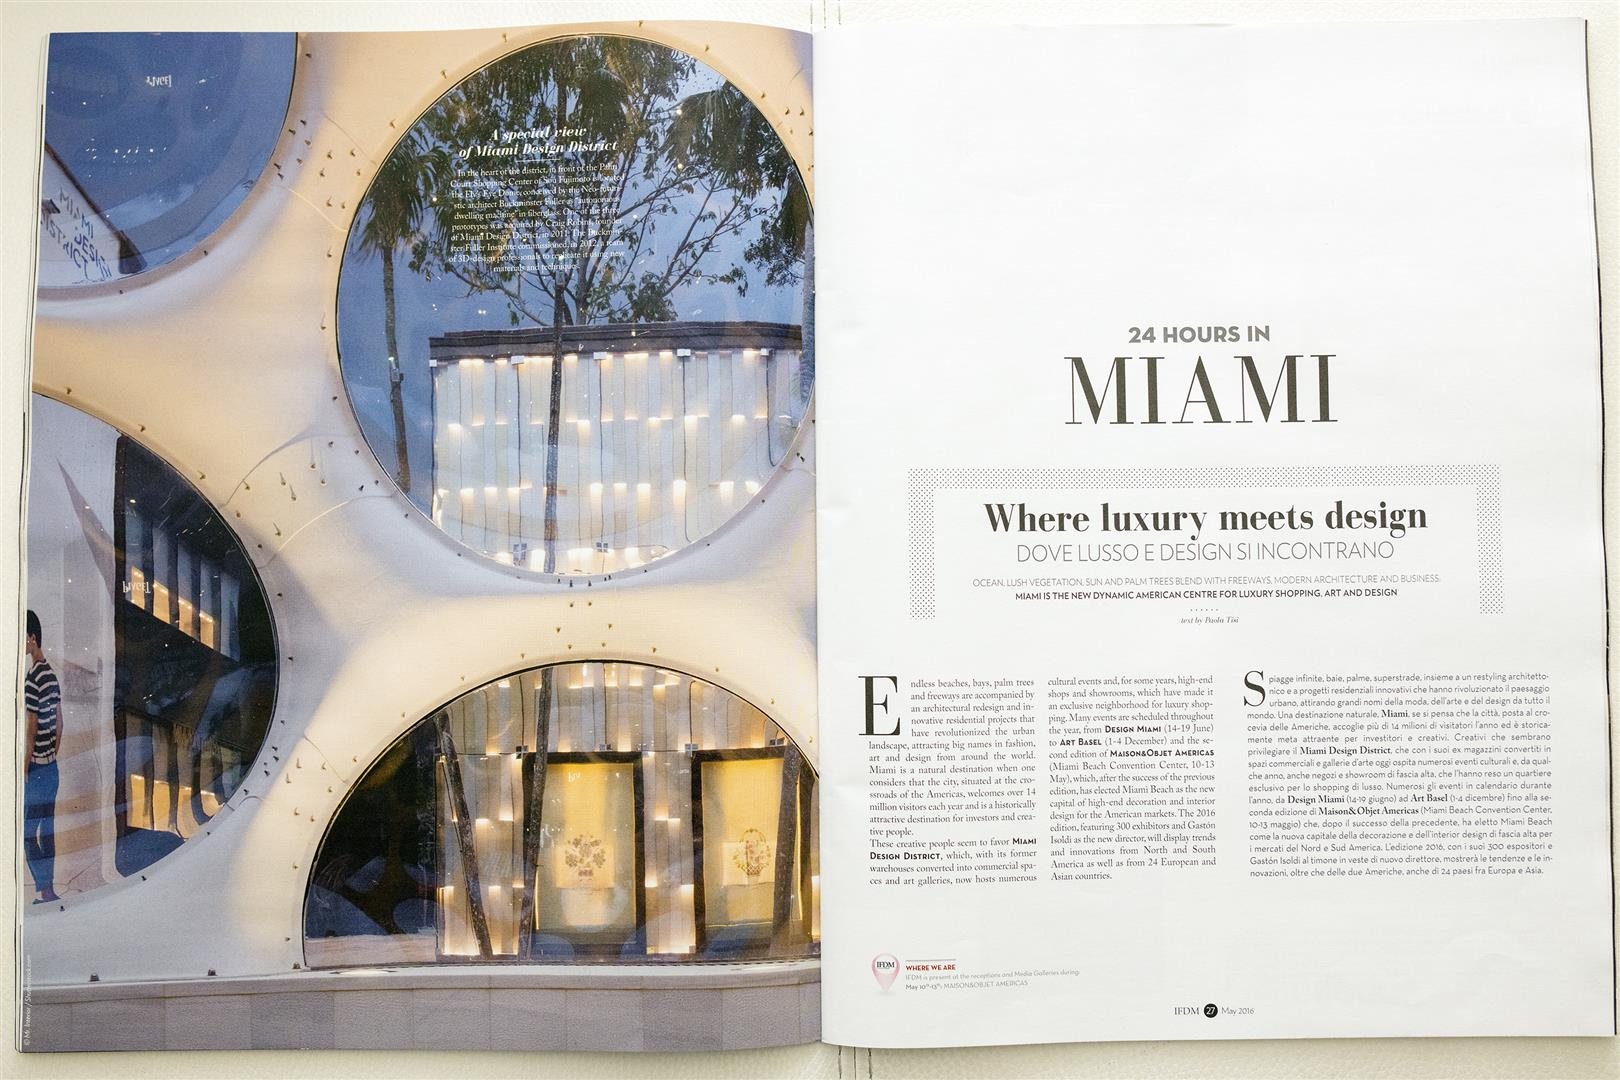 IFDM n.5-2016 USA & Middle East issue print - Christian Klugmann 1.jpg